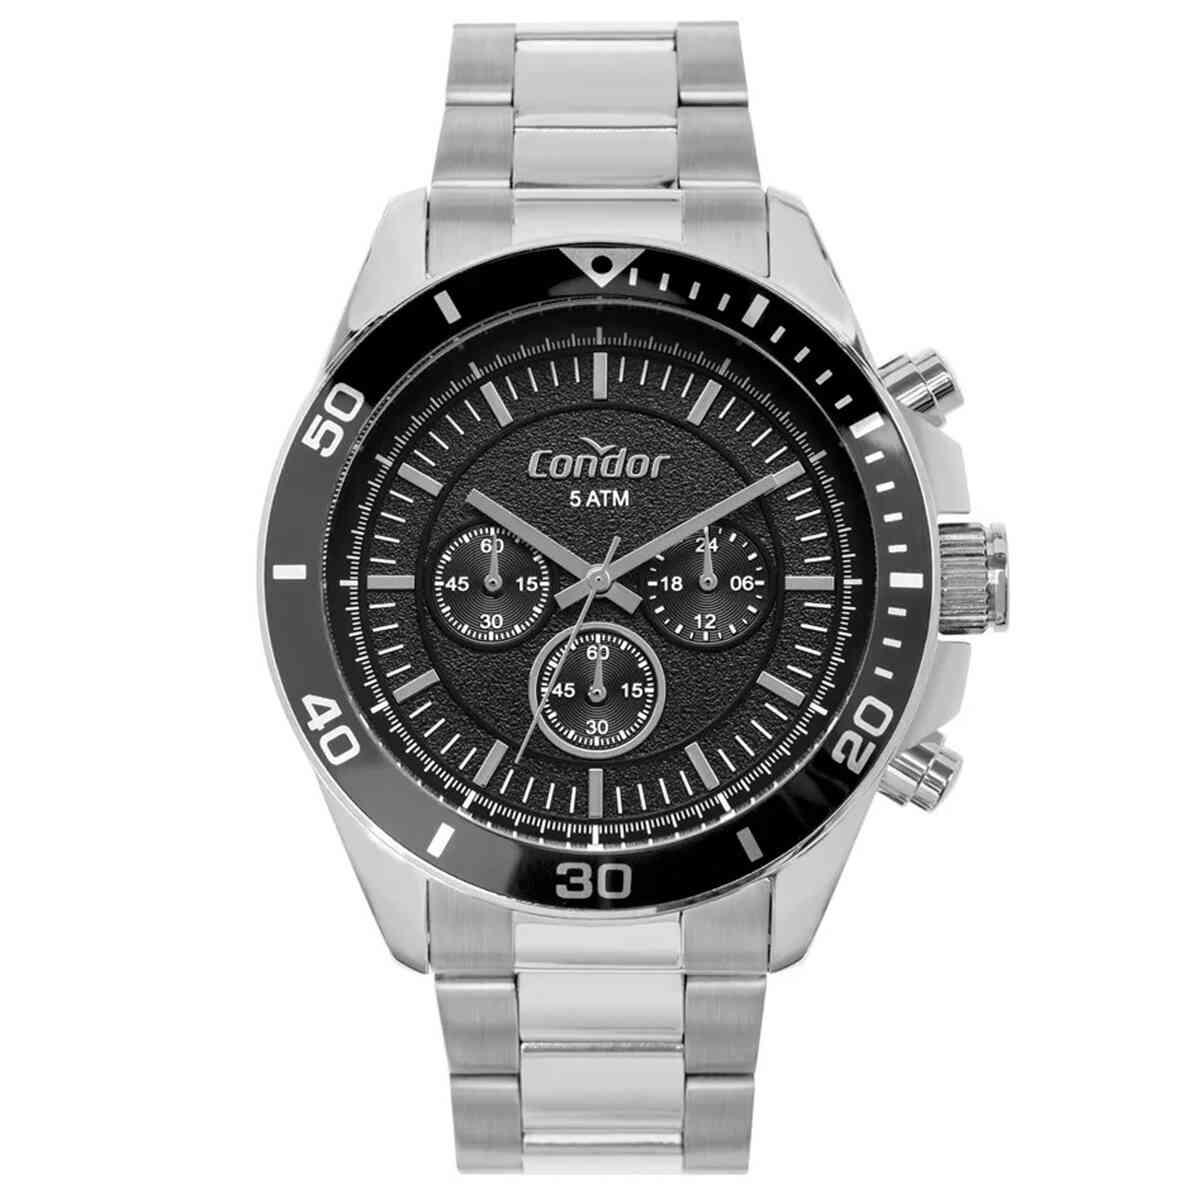 Relógio de Pulso Condor Masculino COVD54B